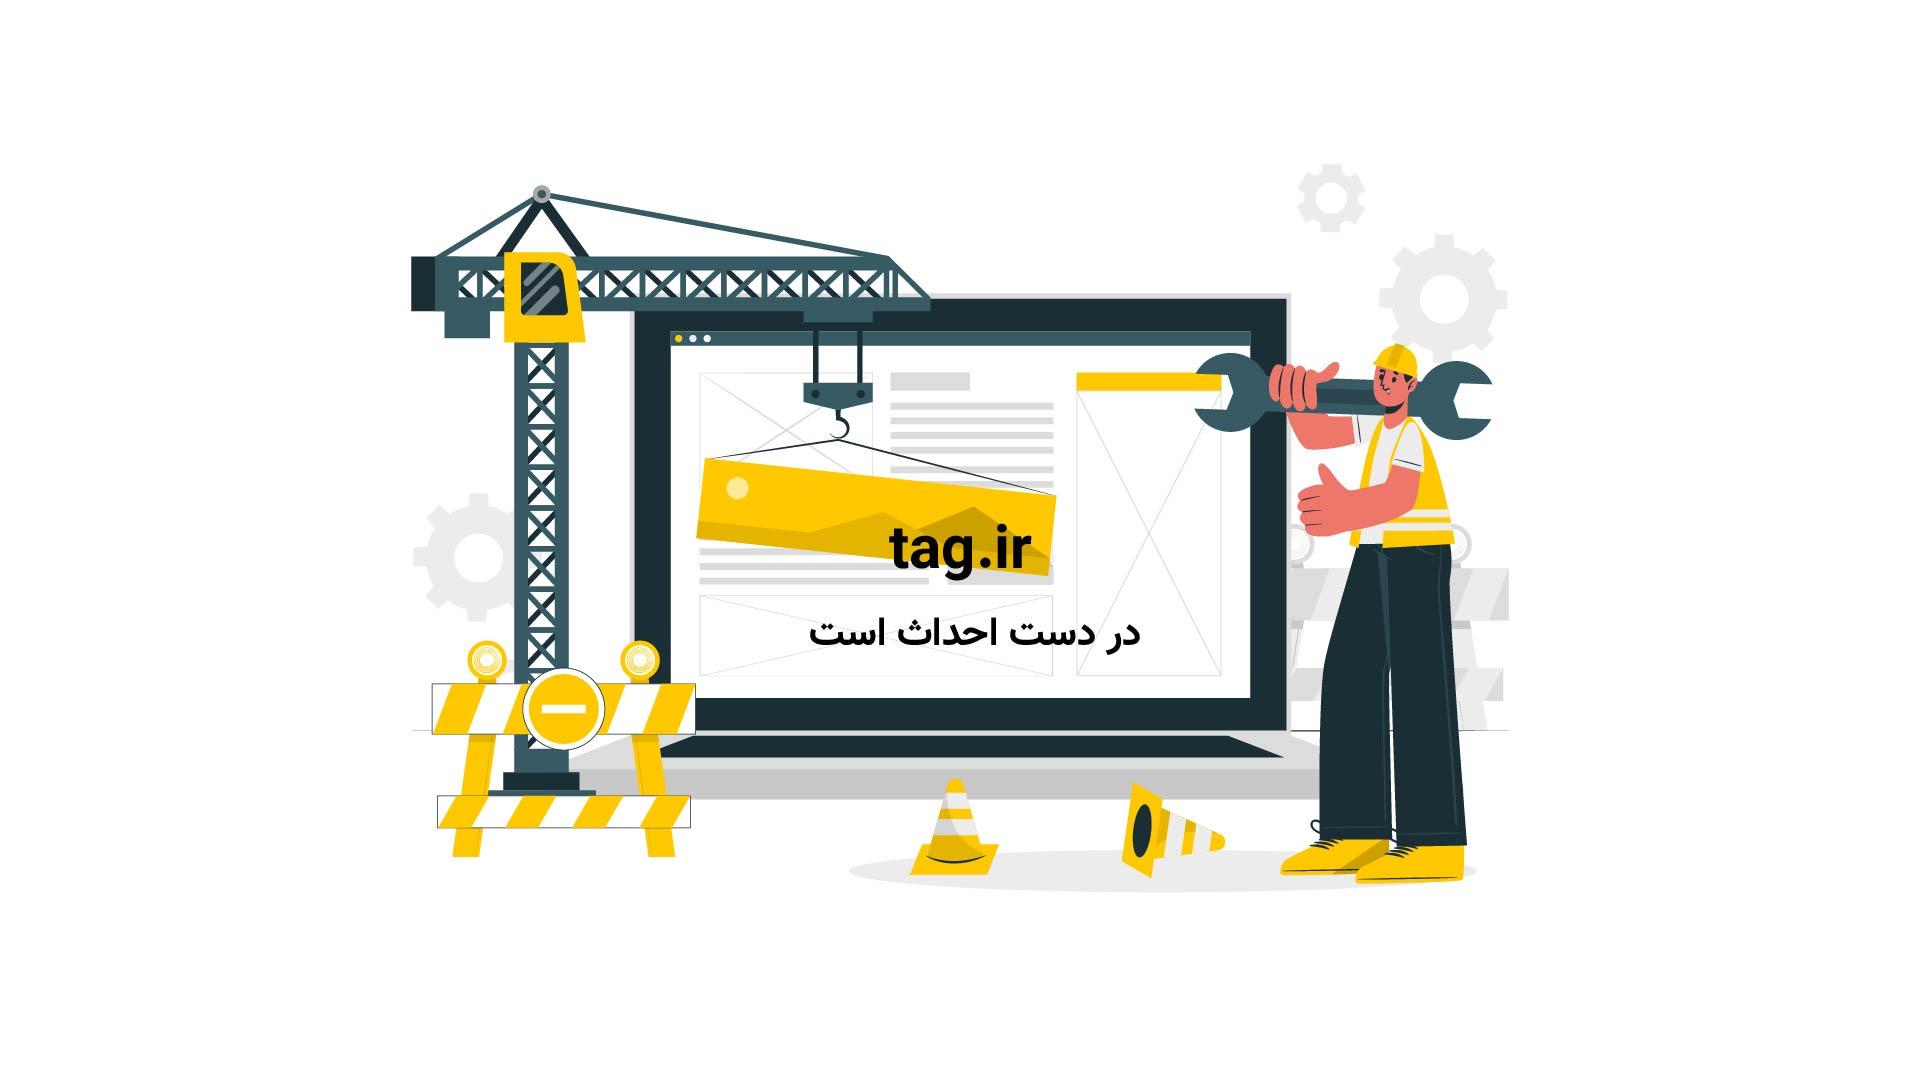 لبخند سعید عزت اللهی | تگ